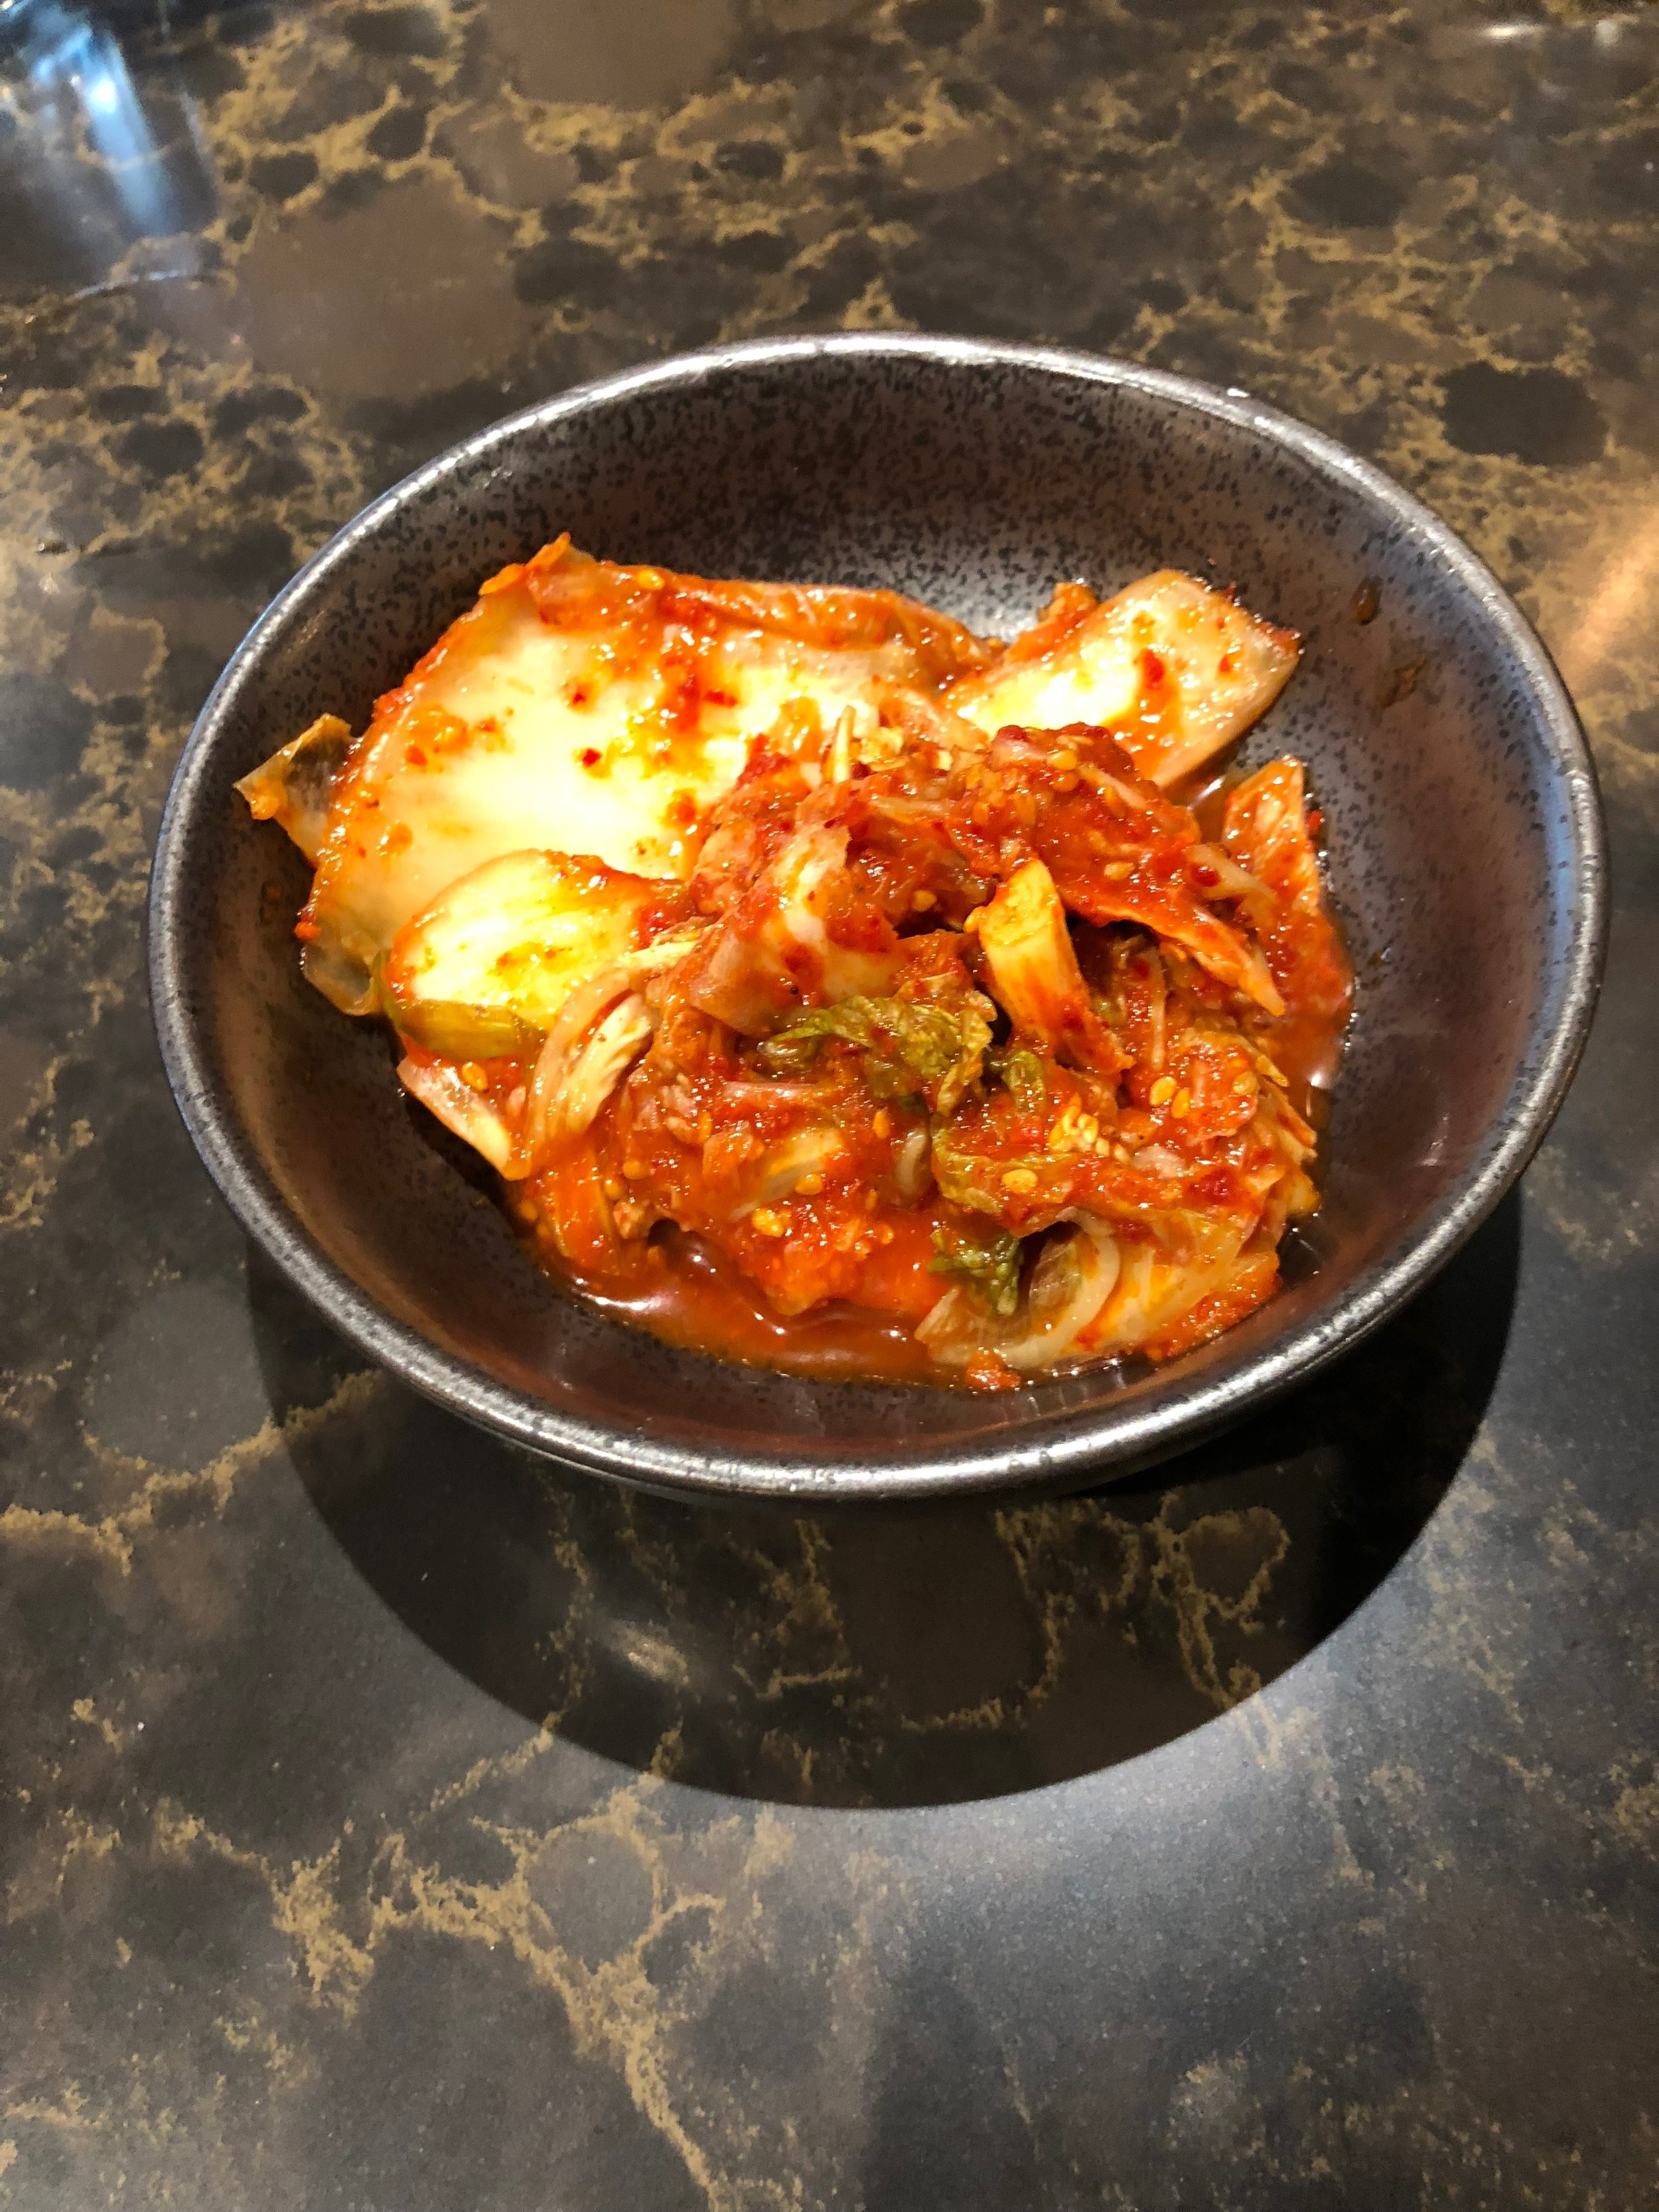 Fermentation turns cabbage into kimchi. Mmm